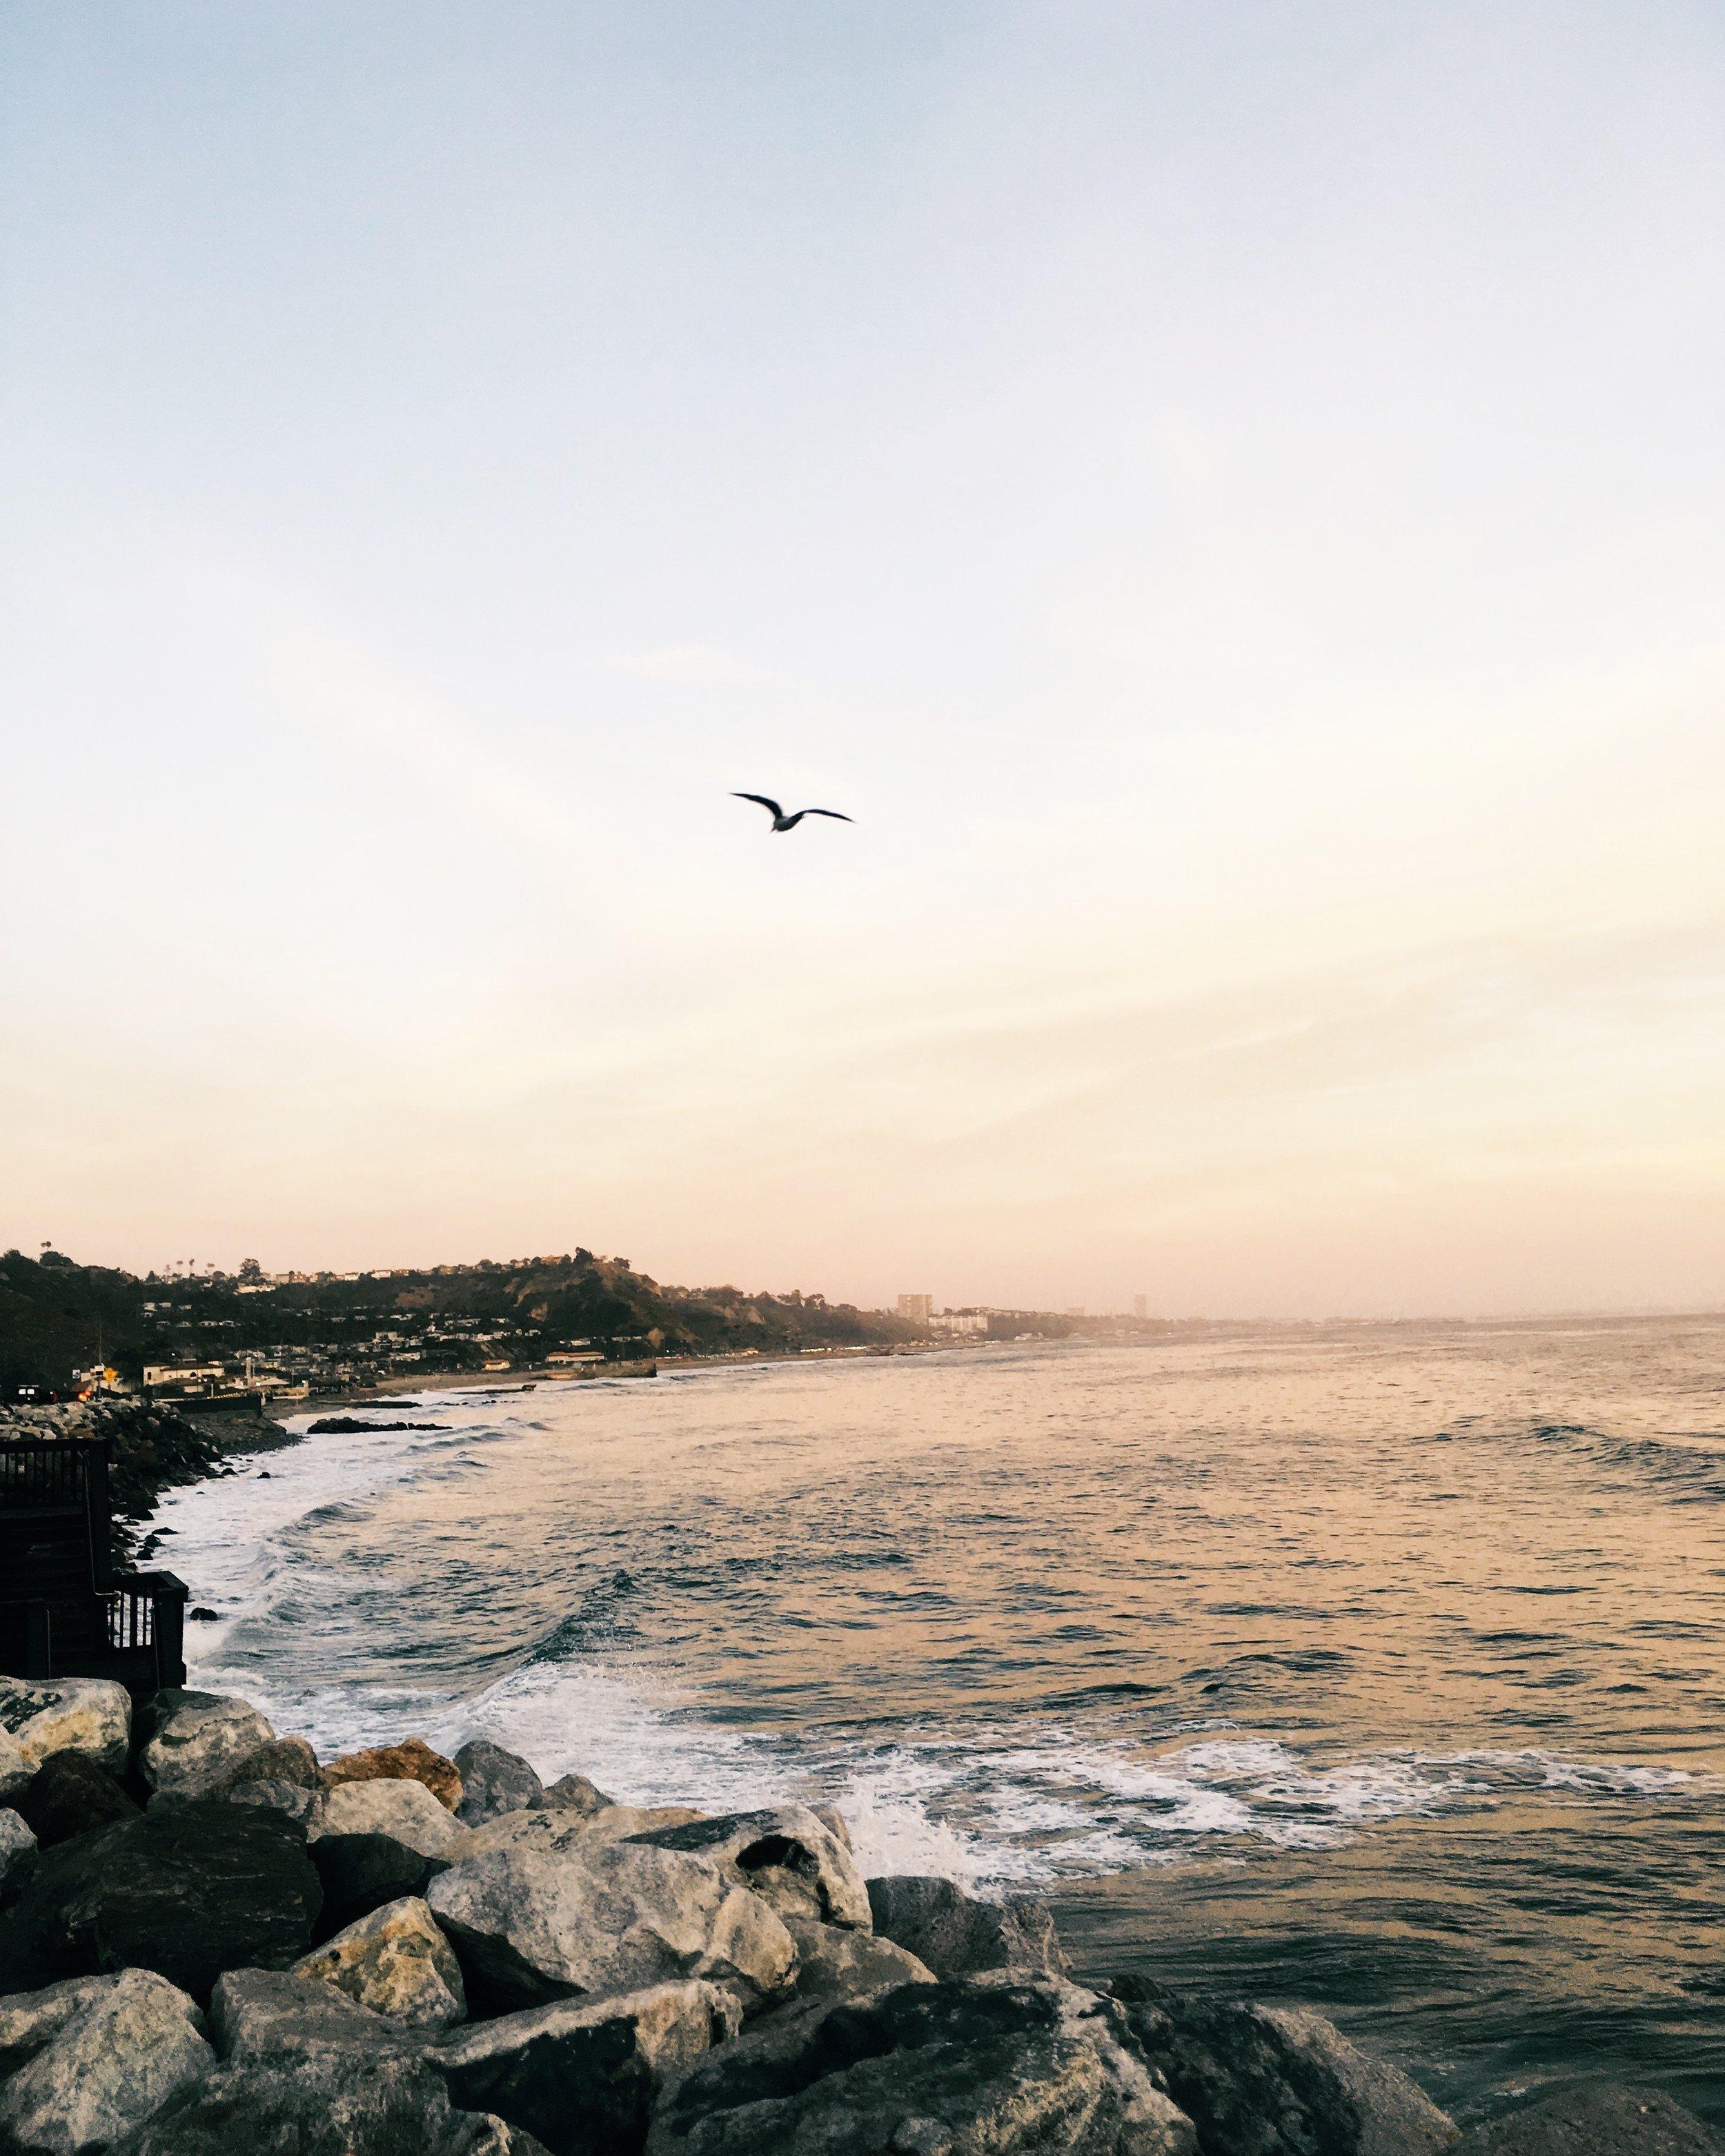 Malibu by Liz Gardner